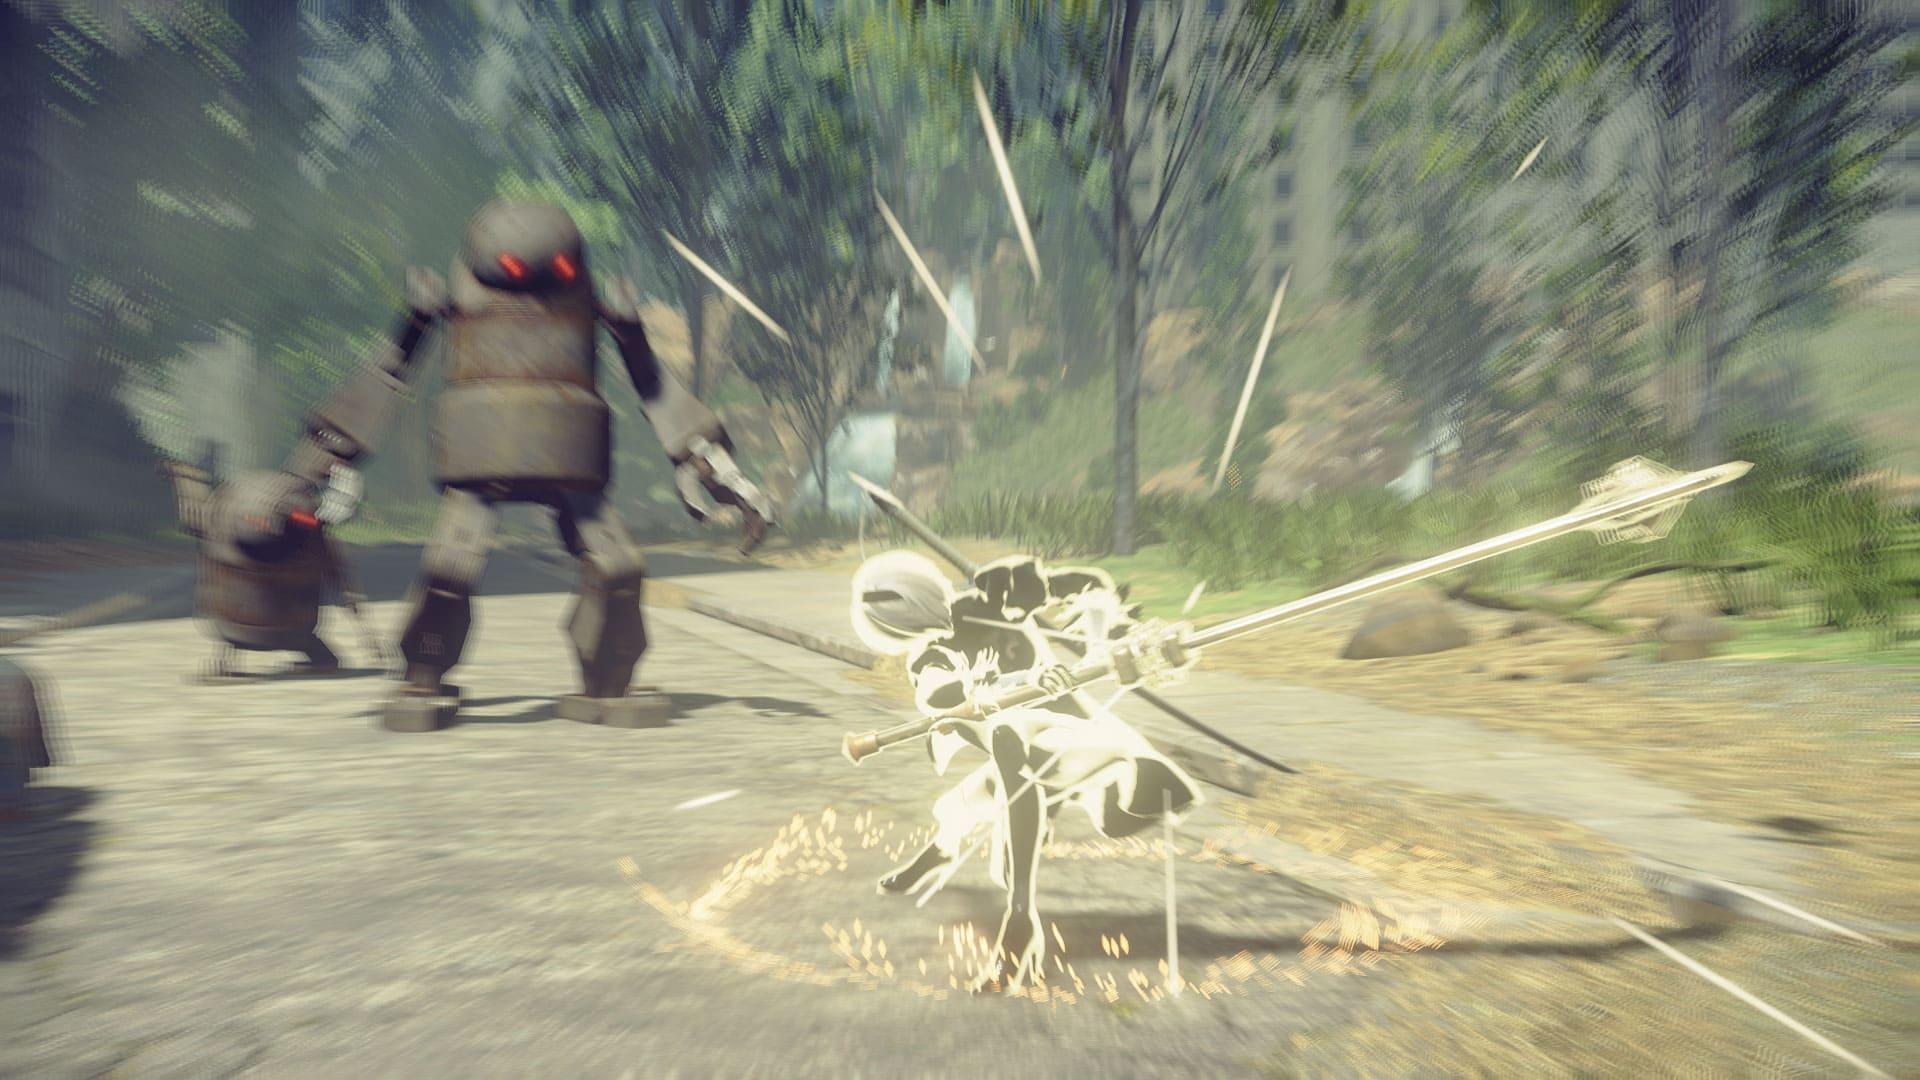 Análisis de NieR Automata - Xbox One 2